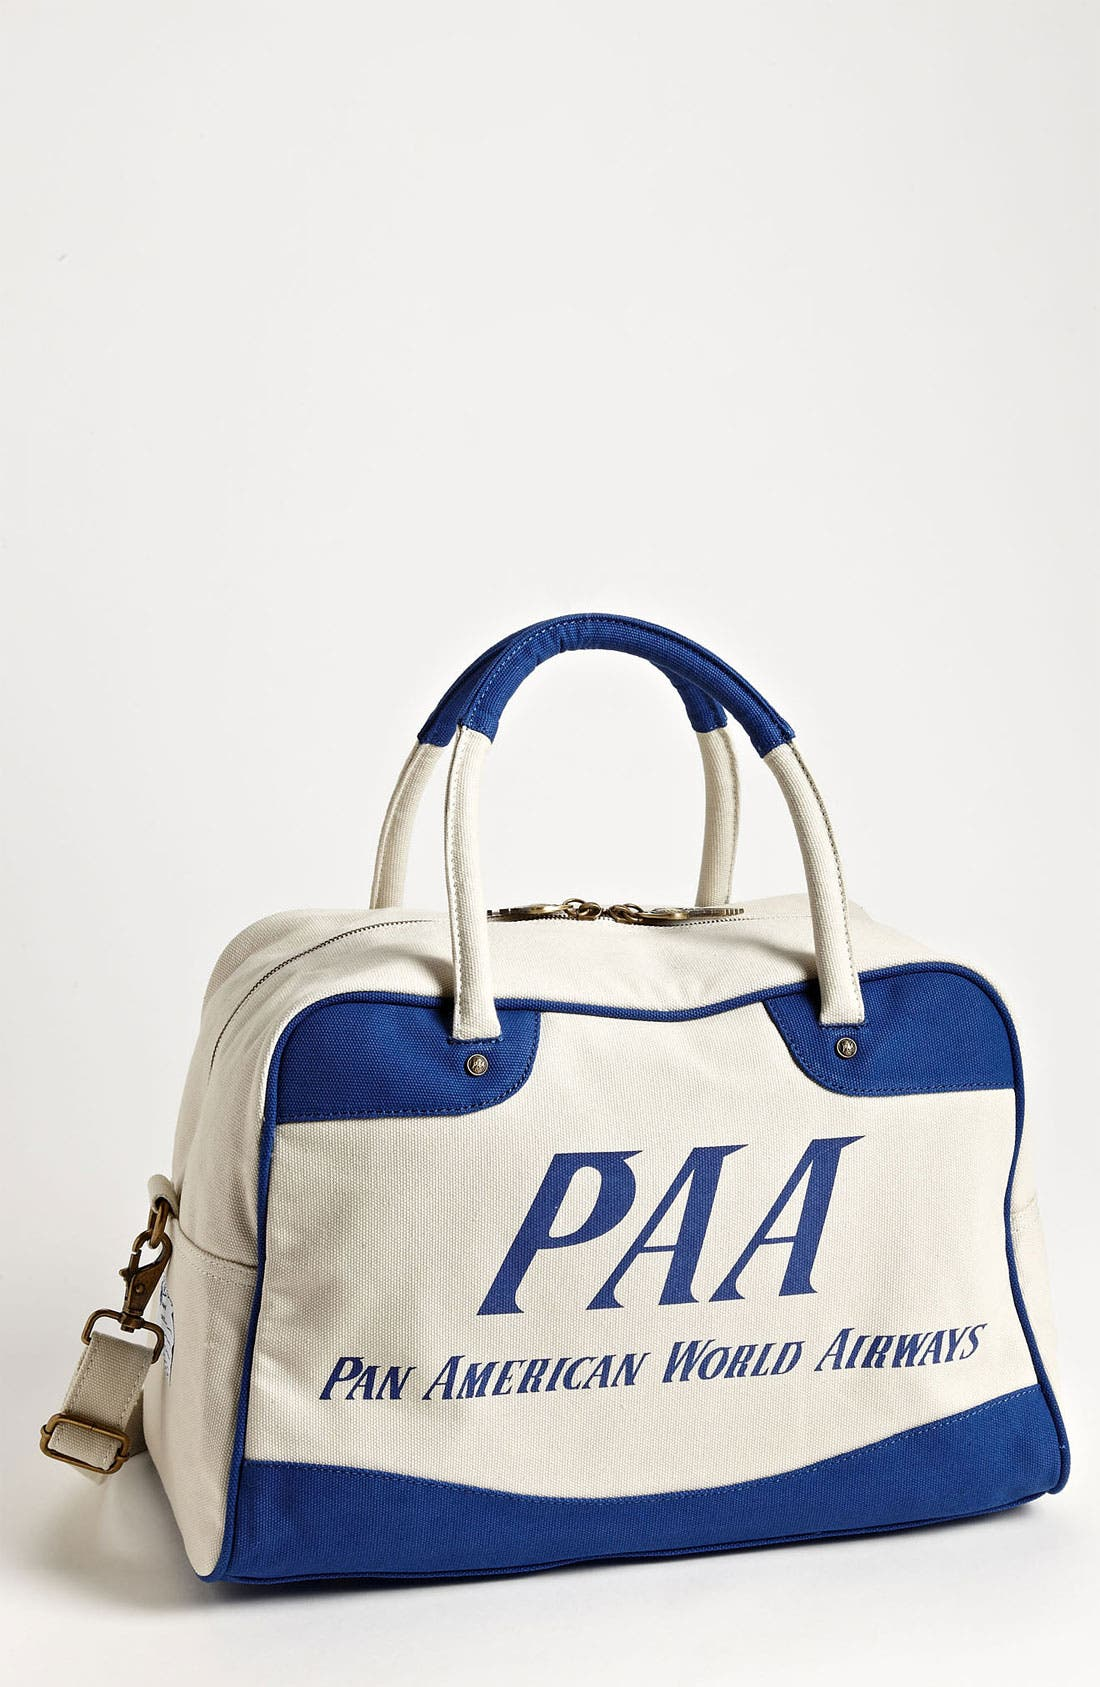 Alternate Image 1 Selected - Pan Am 'PAA Presidential' Duffel Bag